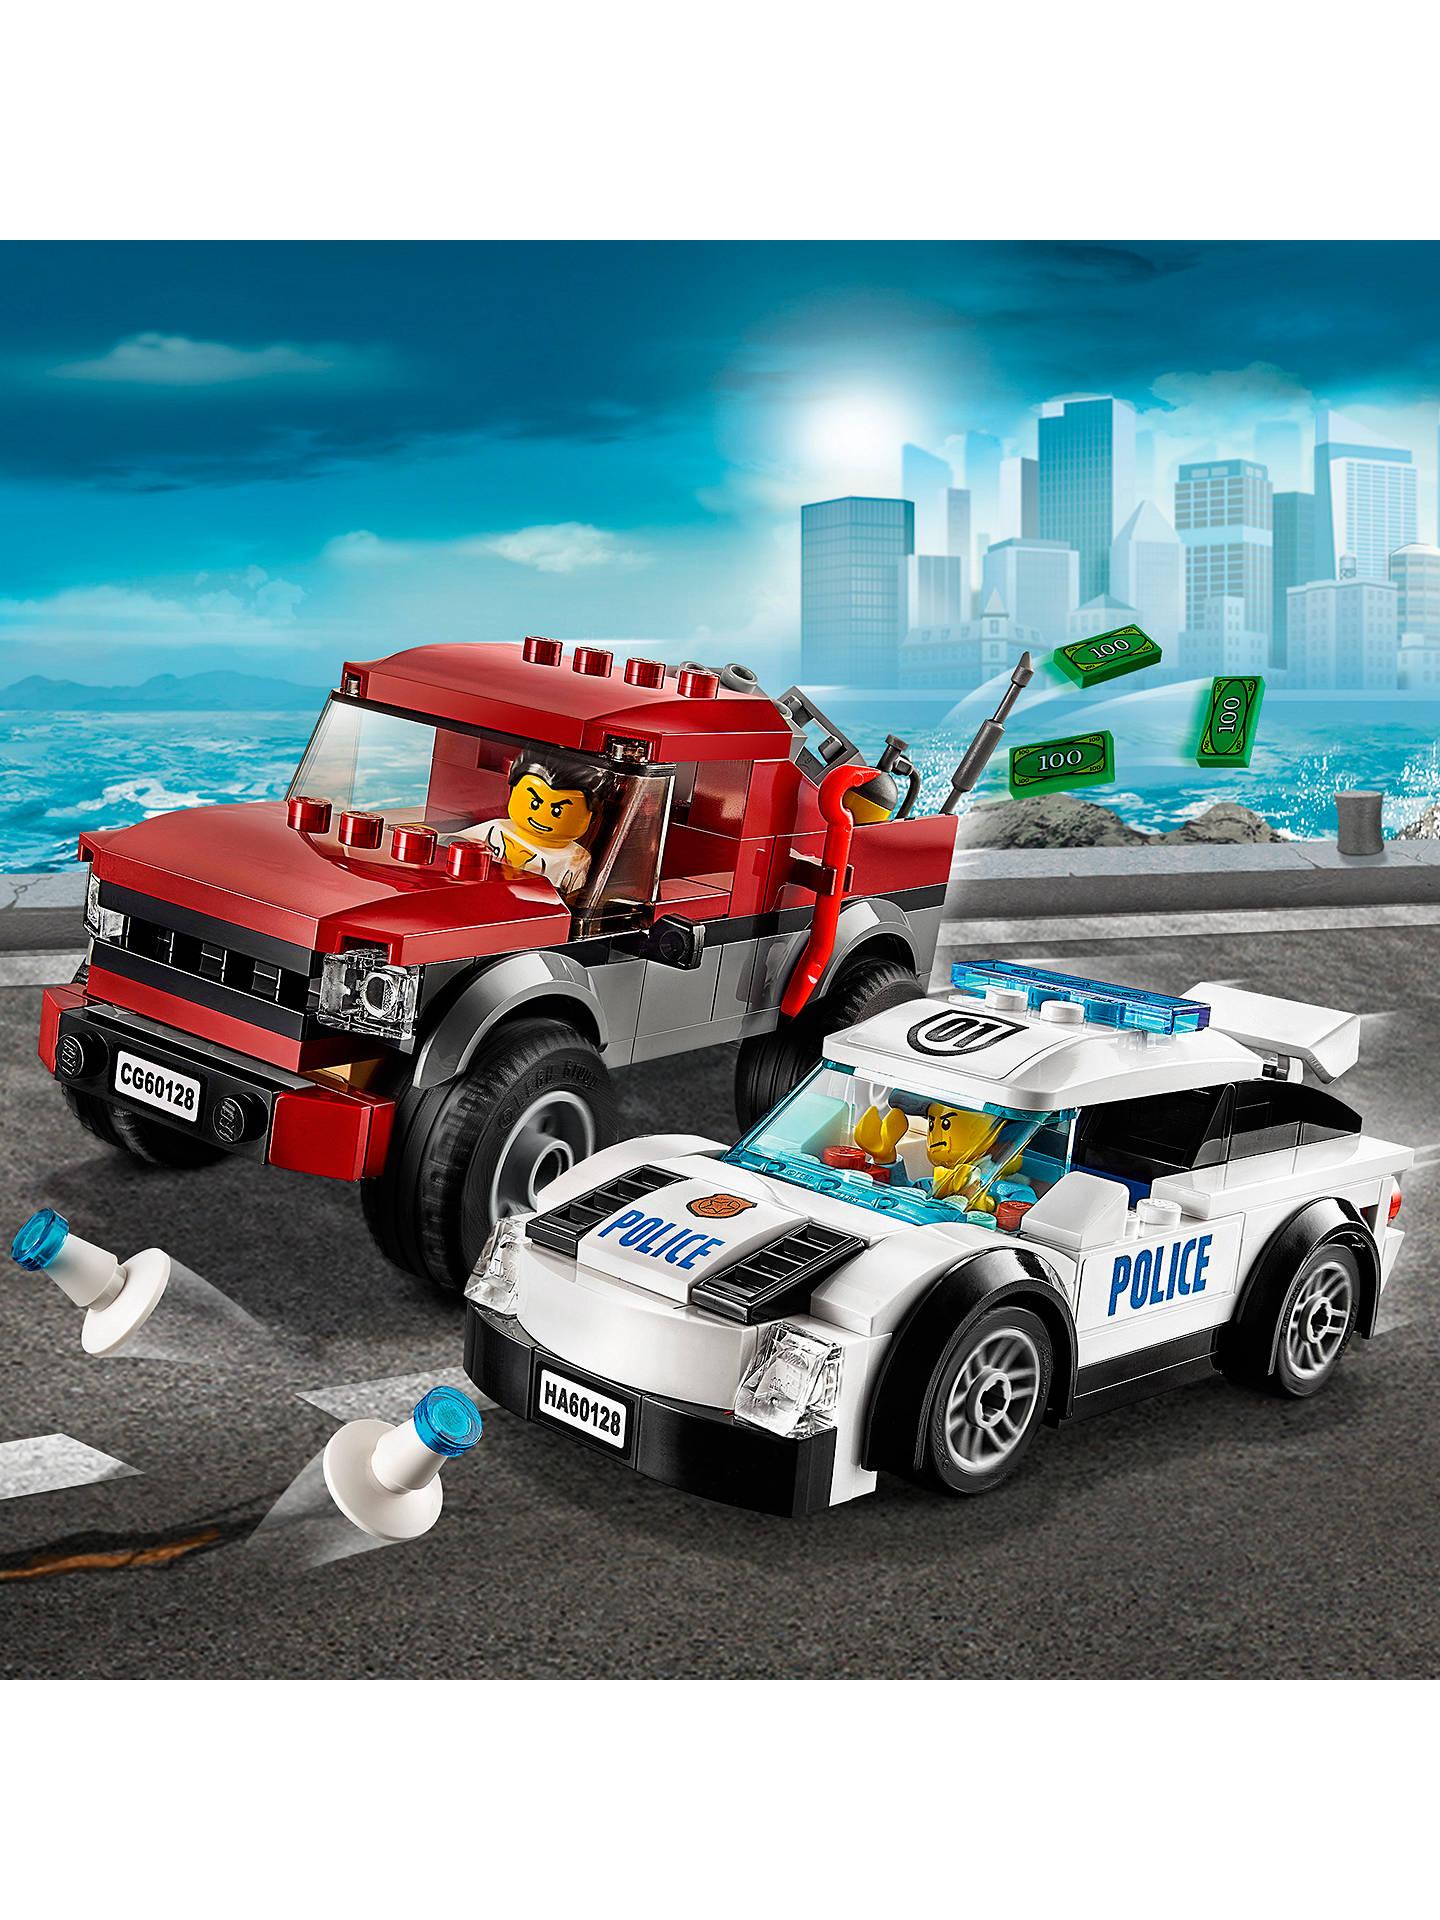 LEGO City 60128 Police Pursuit at John Lewis & Partners